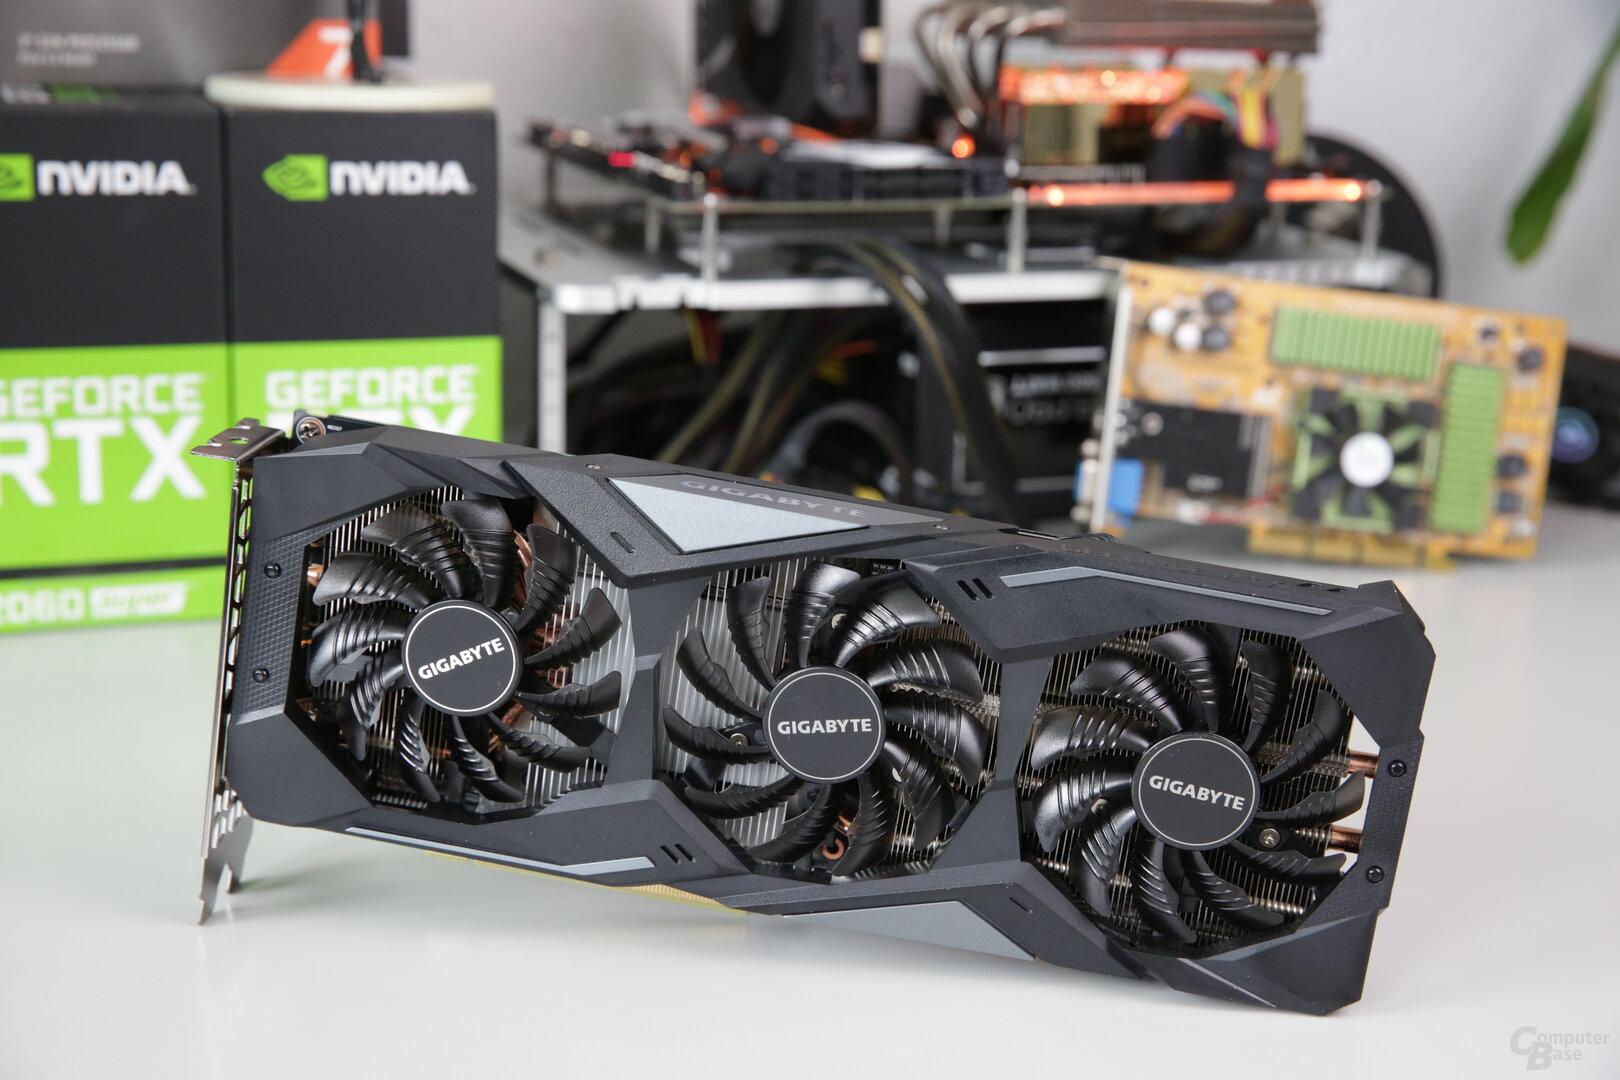 Gigabyte GeForce RTX 2060 Super Gaming PC